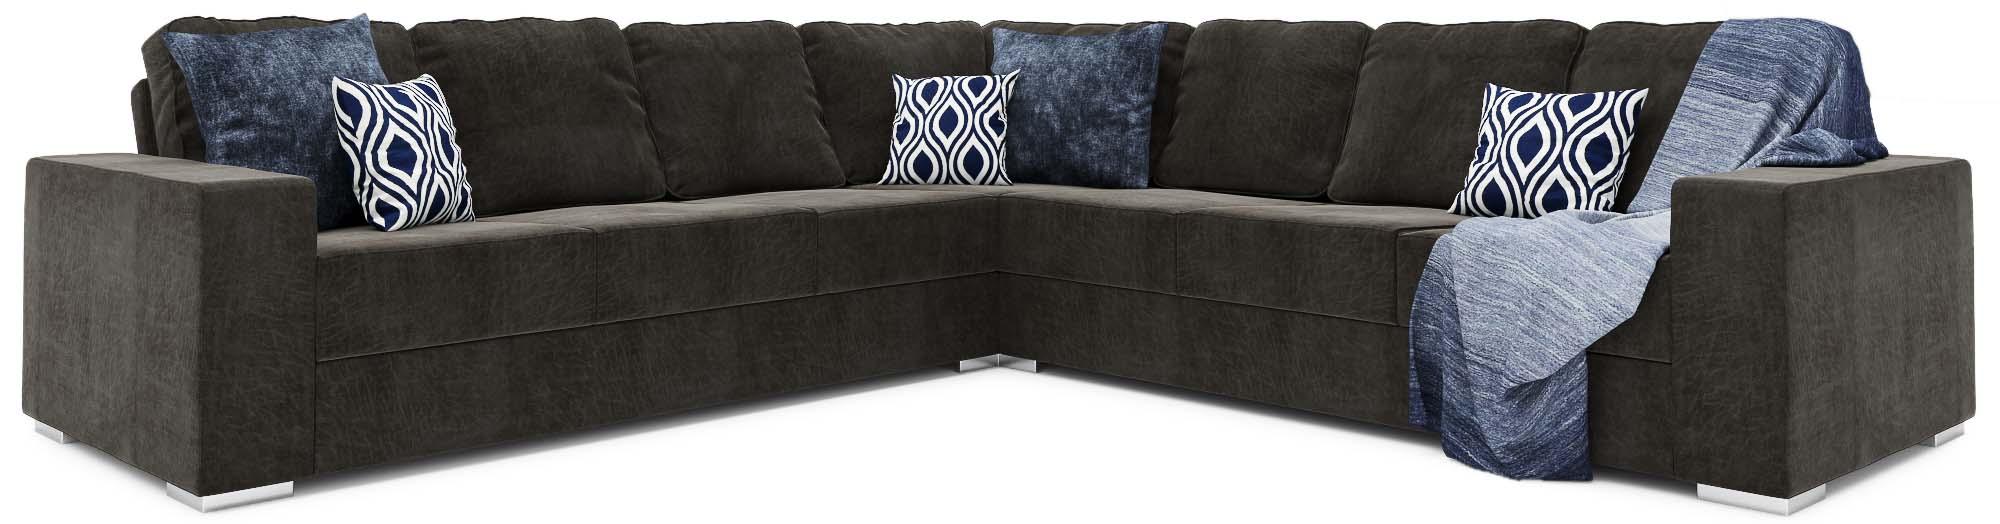 Ato 4X4 Corner Double Sofa Bed